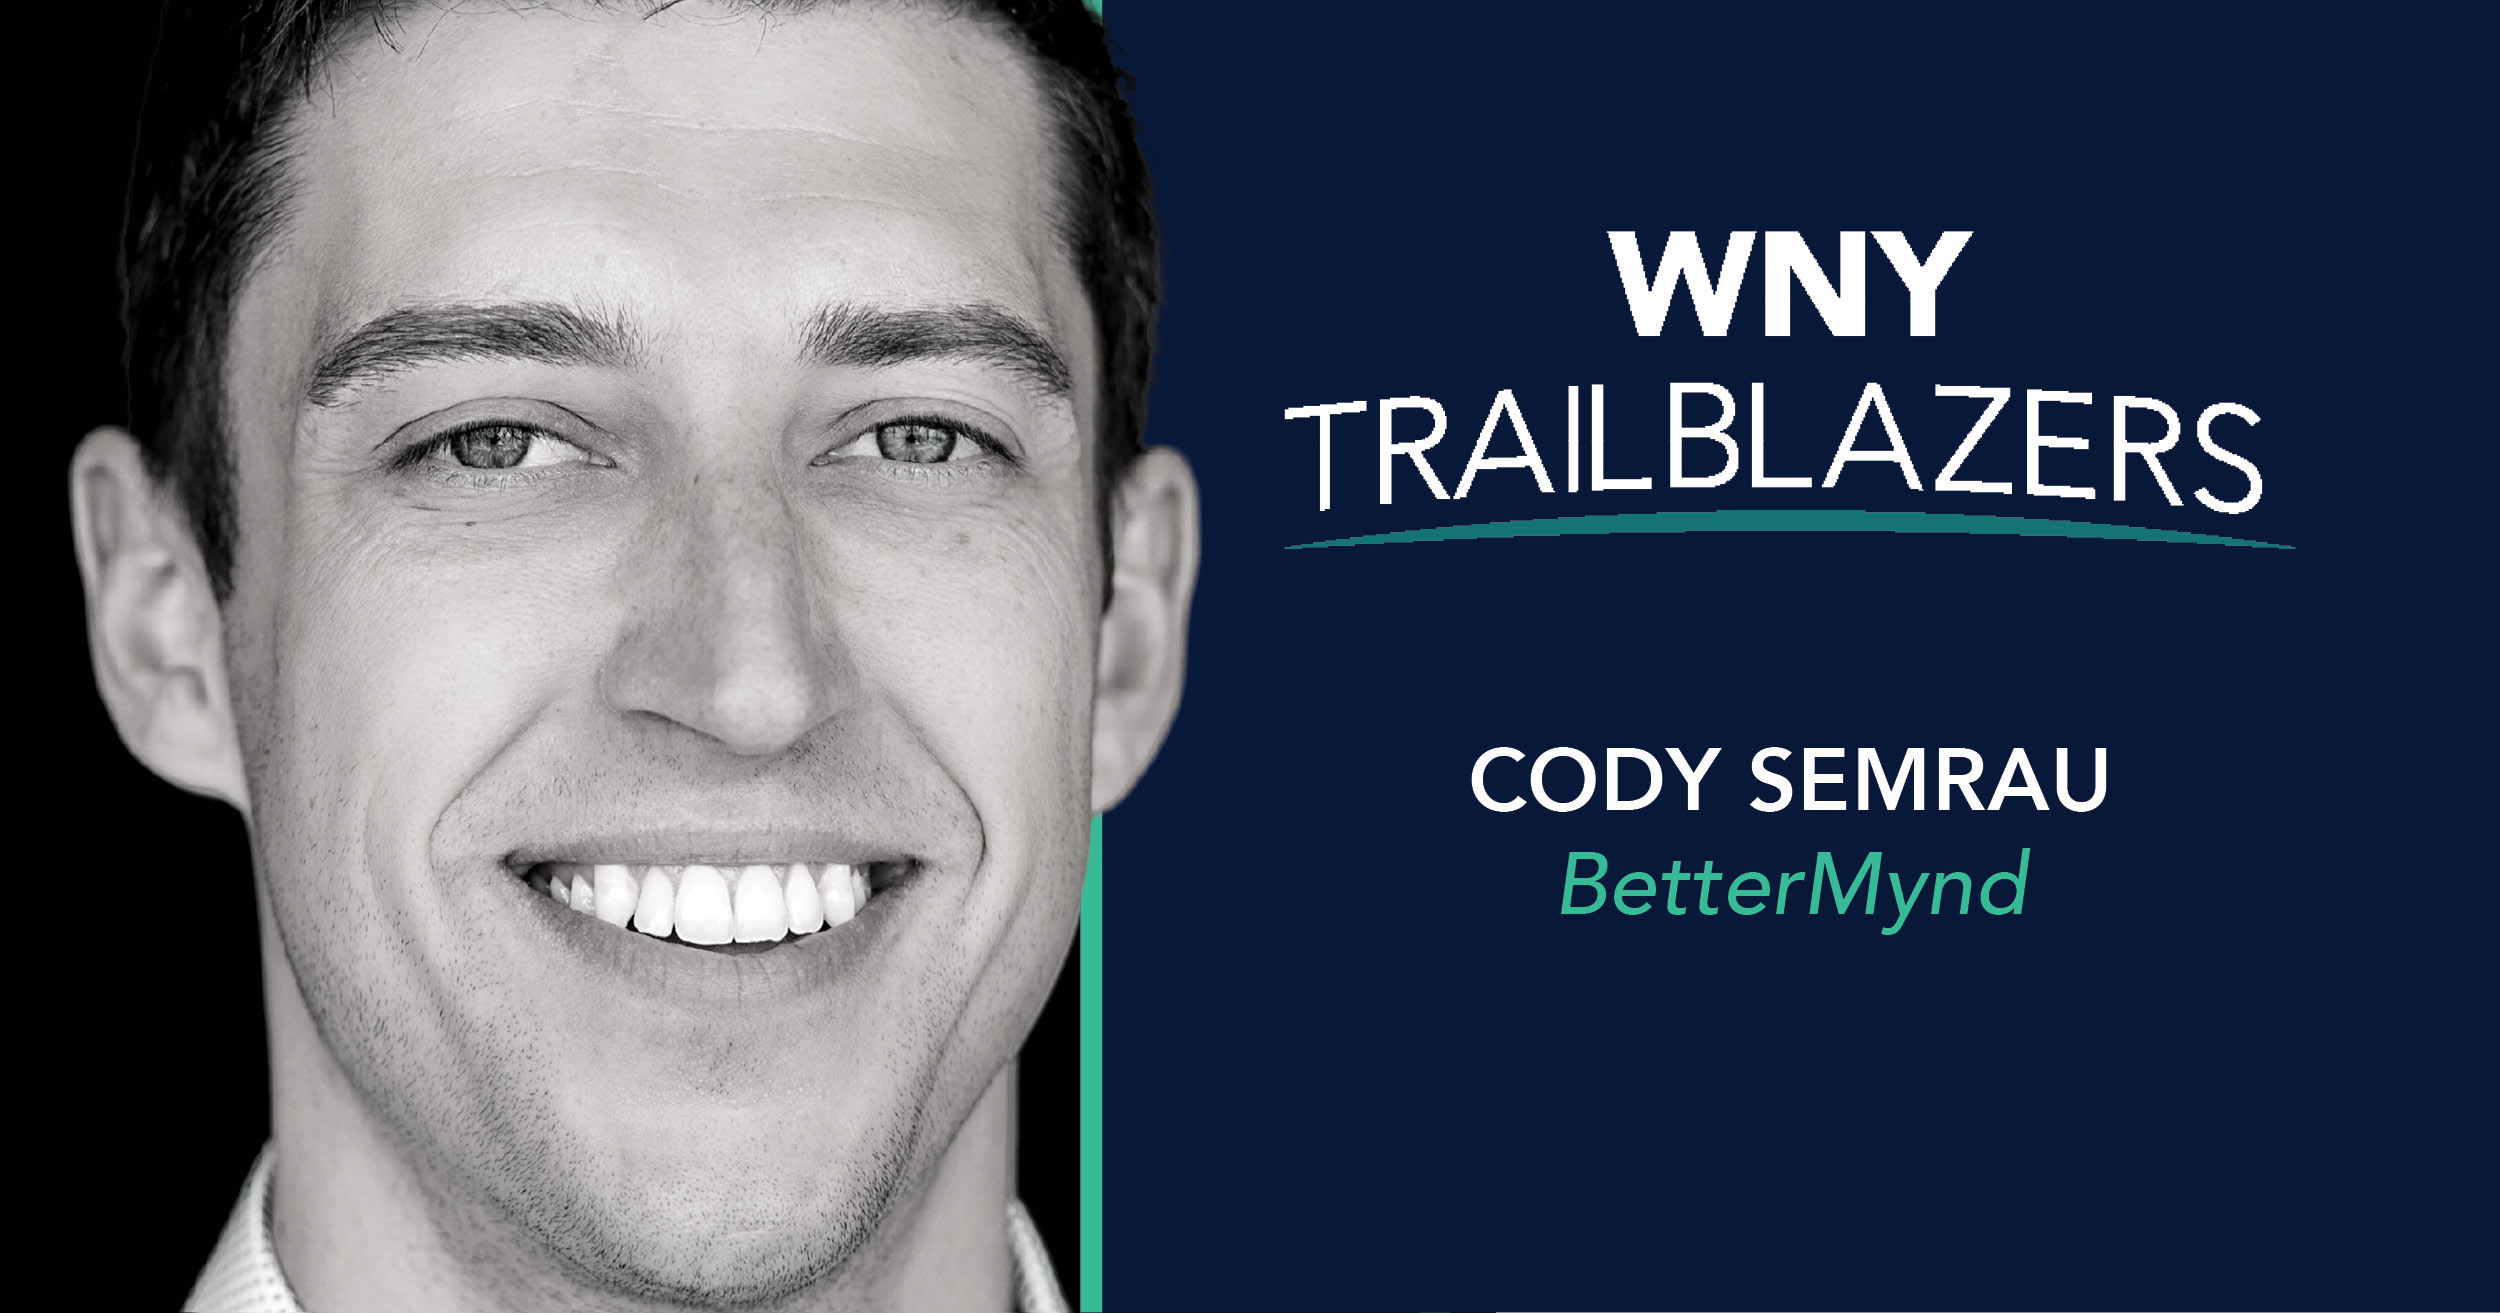 Western New York Trailblazers: Cody Semrau